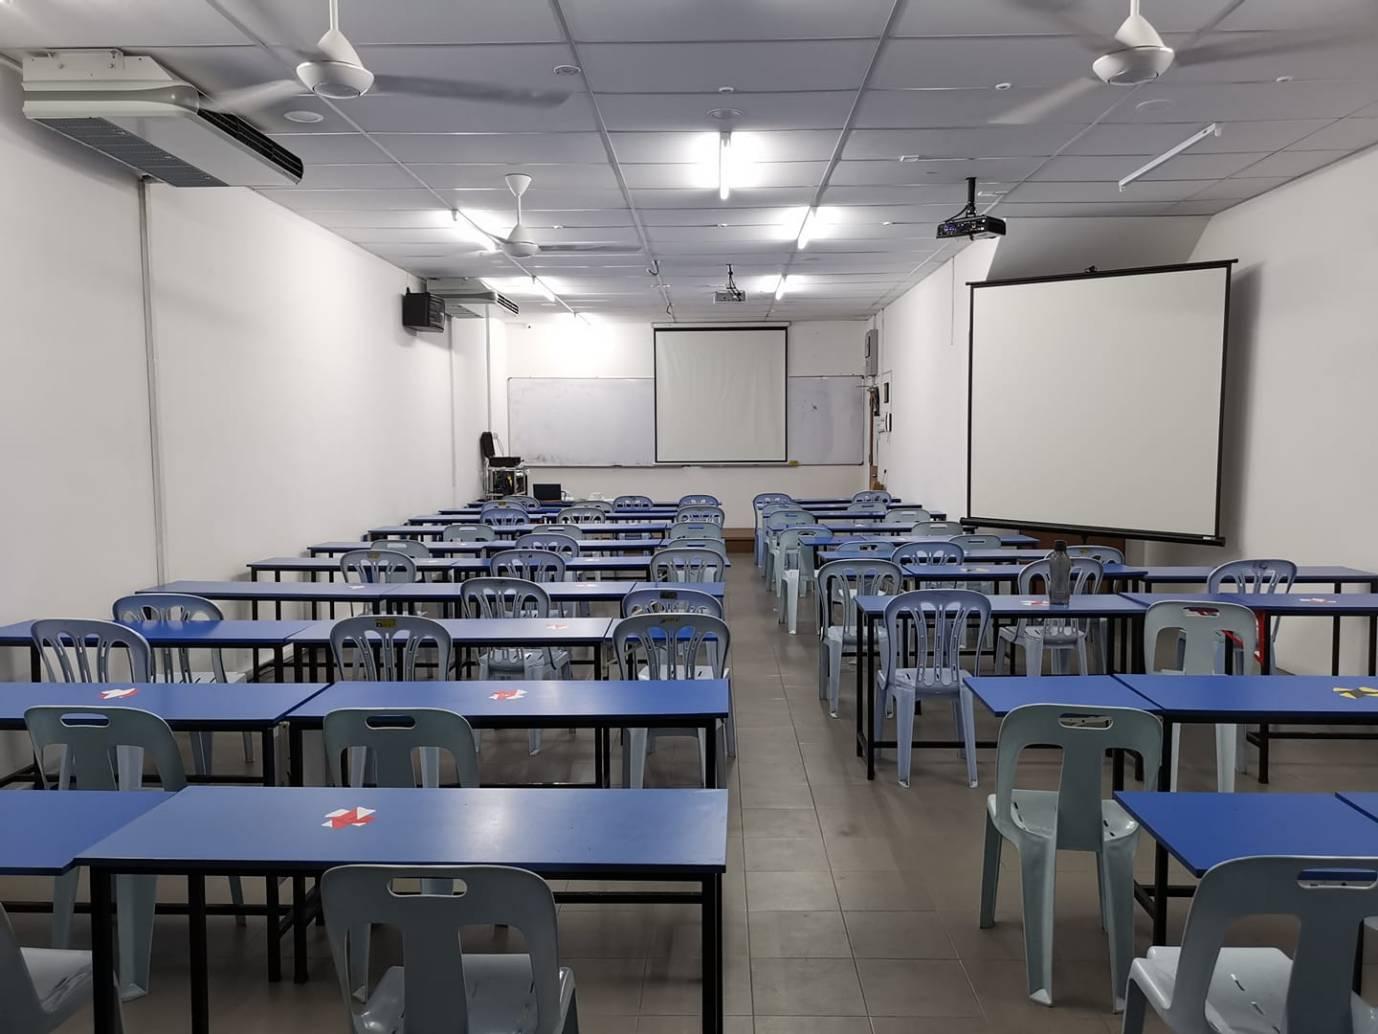 名字:博雅补习学院 WE EDUCATION